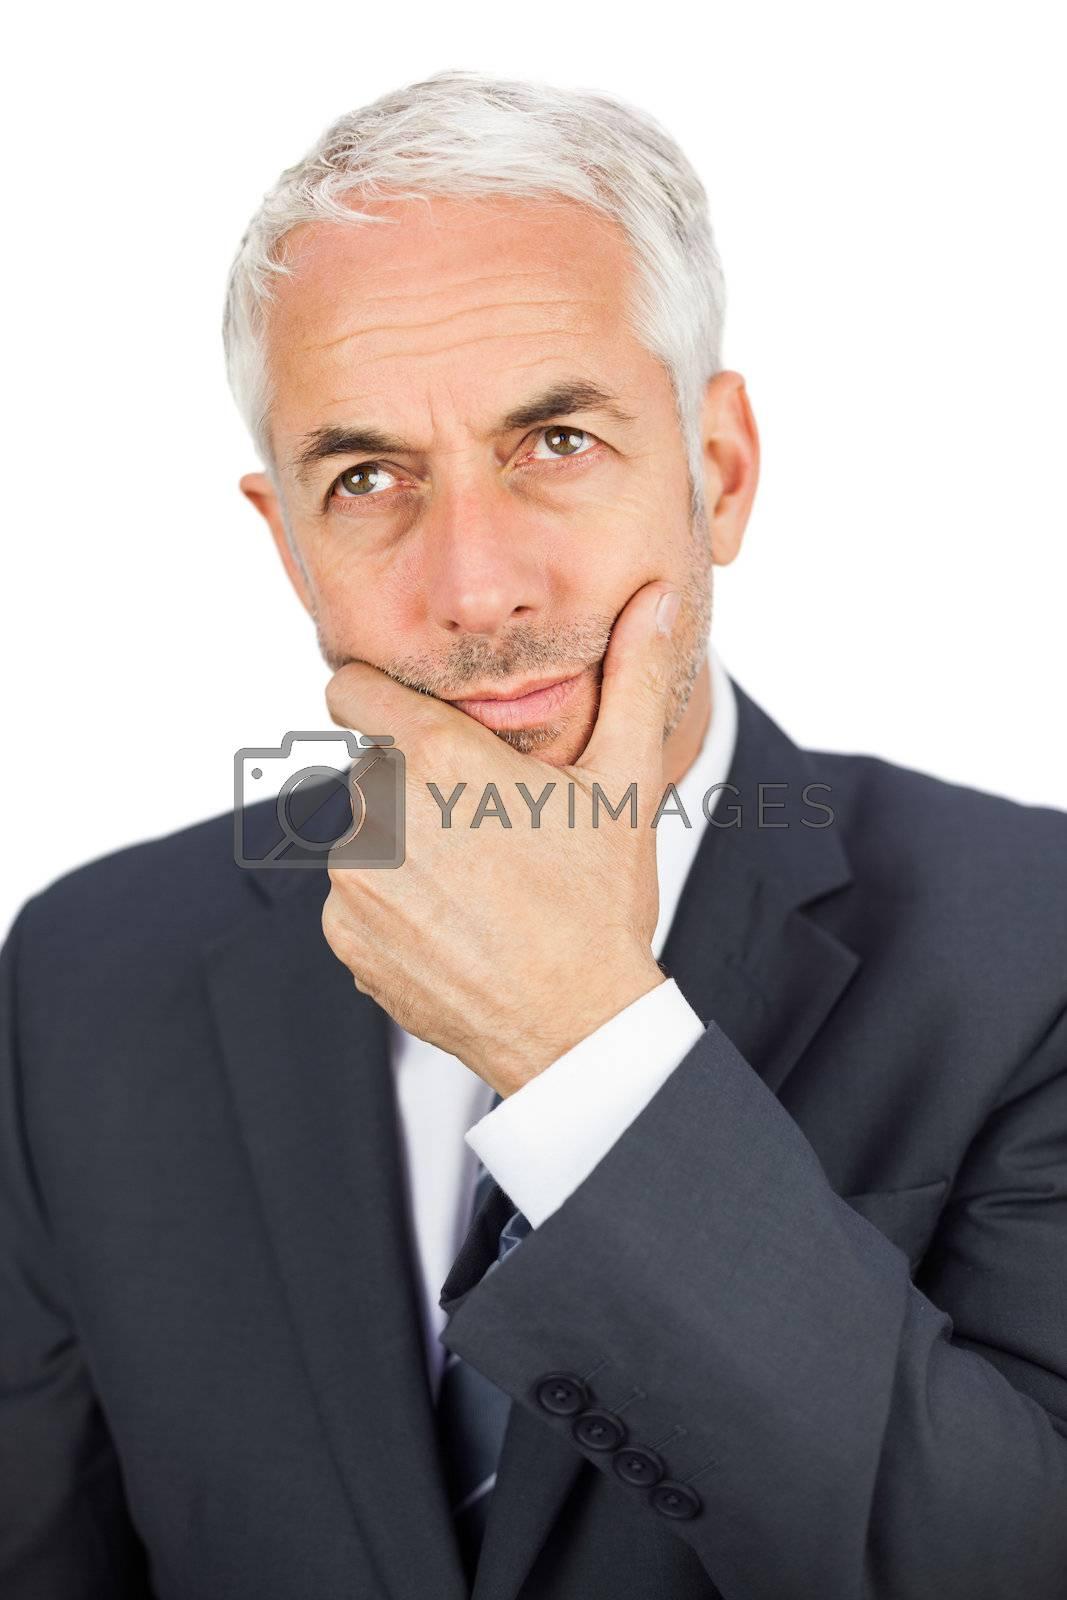 Thoughtful businessman looking away by Wavebreakmedia